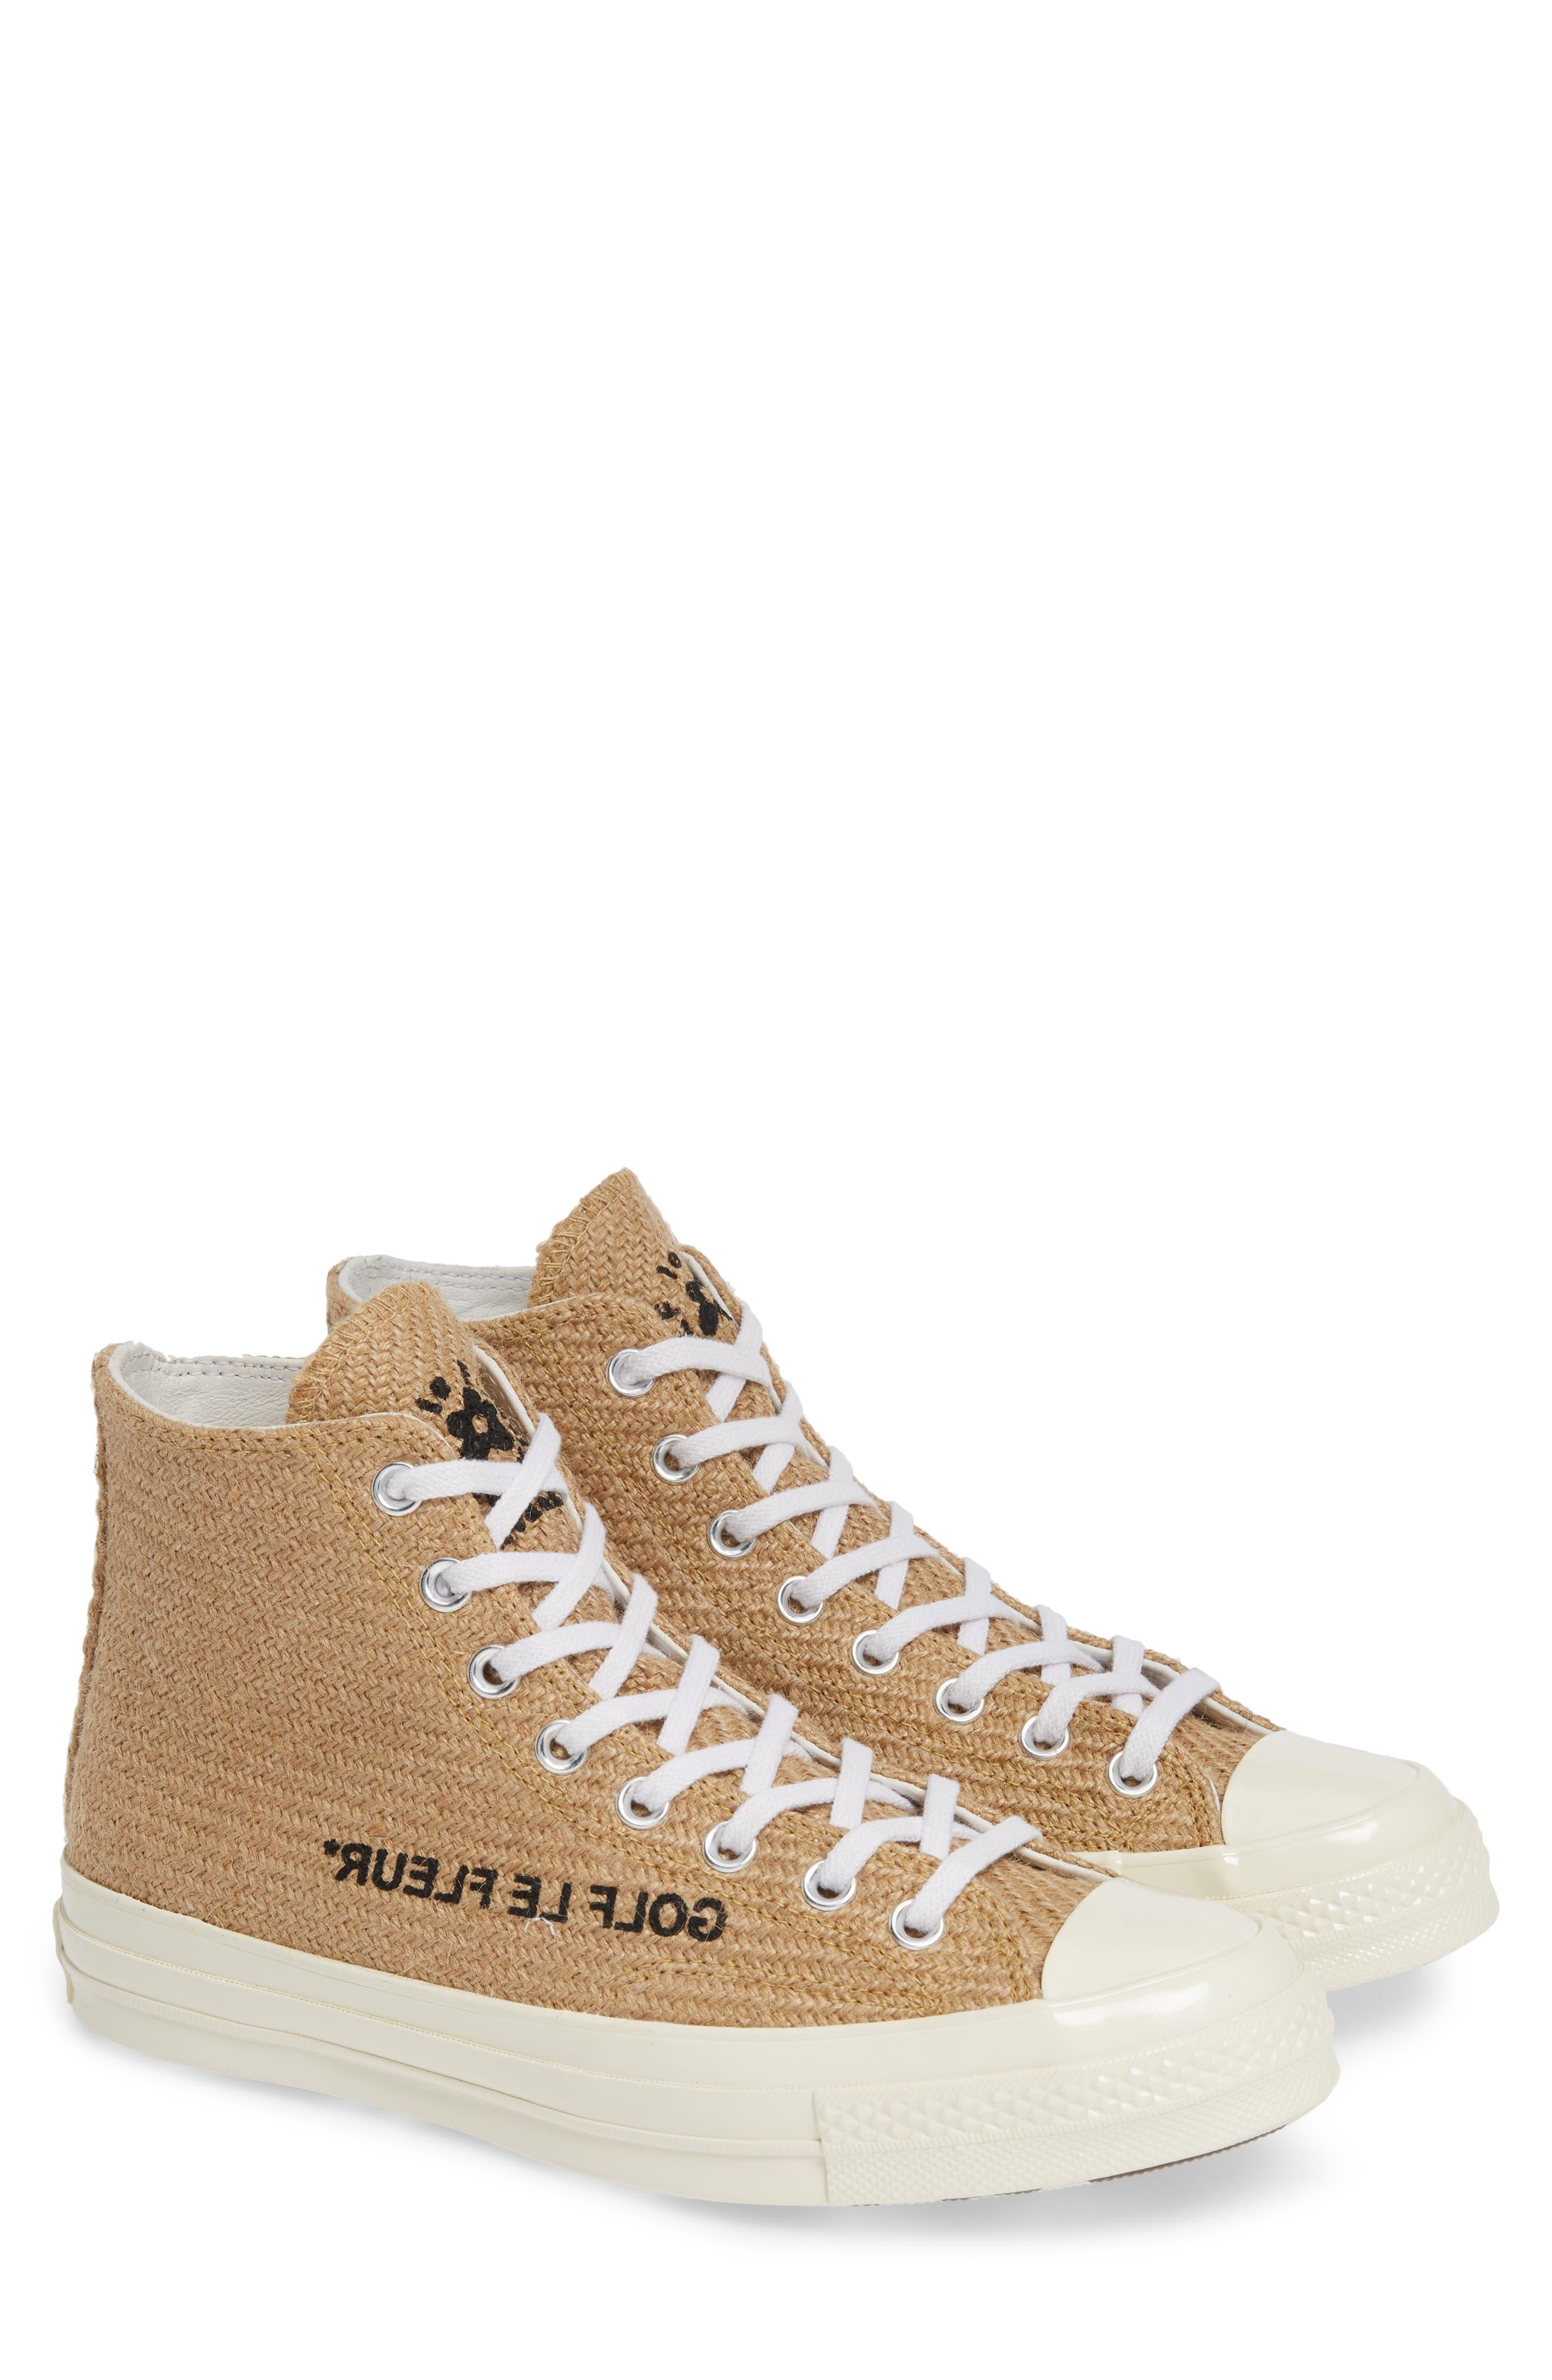 x GOLF le FLEUR* Chuck 70 High Top Sneaker, Main, color, 209